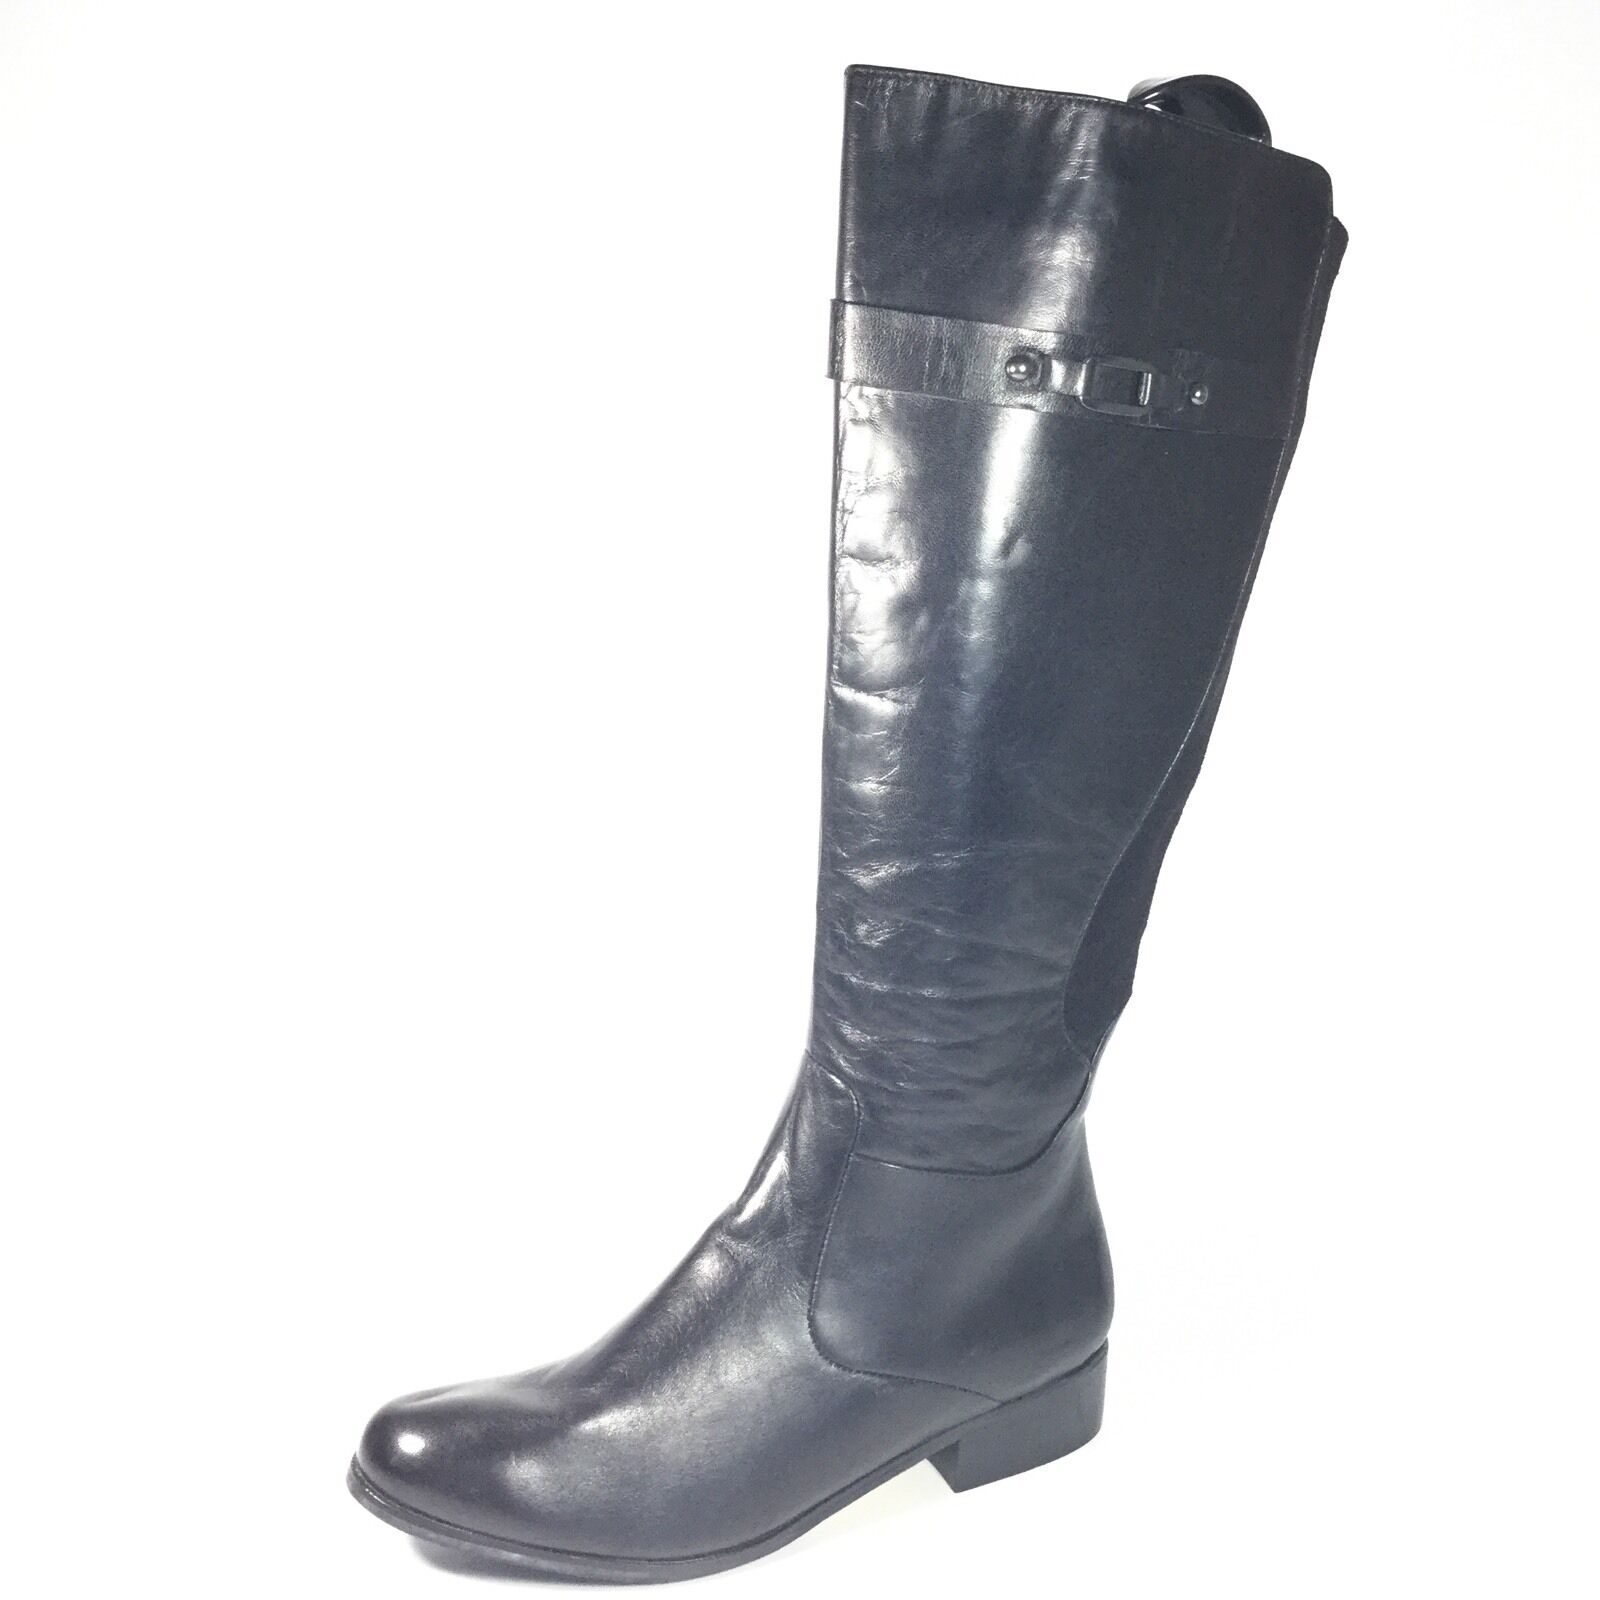 Van Eli Ramex Womens Size 7.5 Black High Knee Boots.